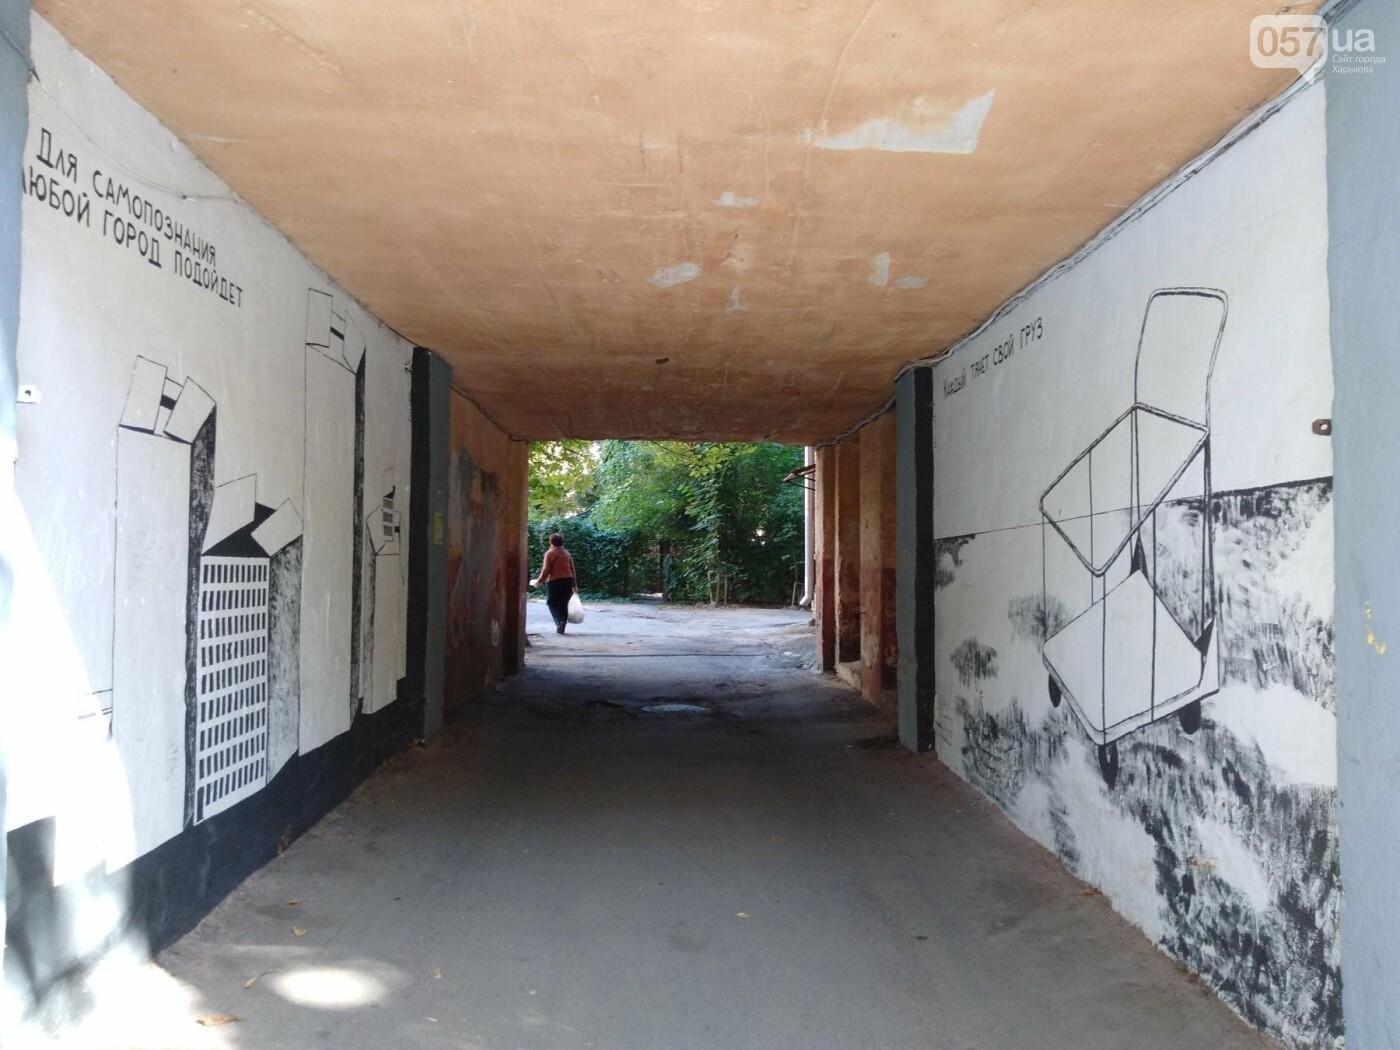 Стрит-арт Гамлета в Харькове: ТОП-10 граффити художника, - ФОТО, фото-5